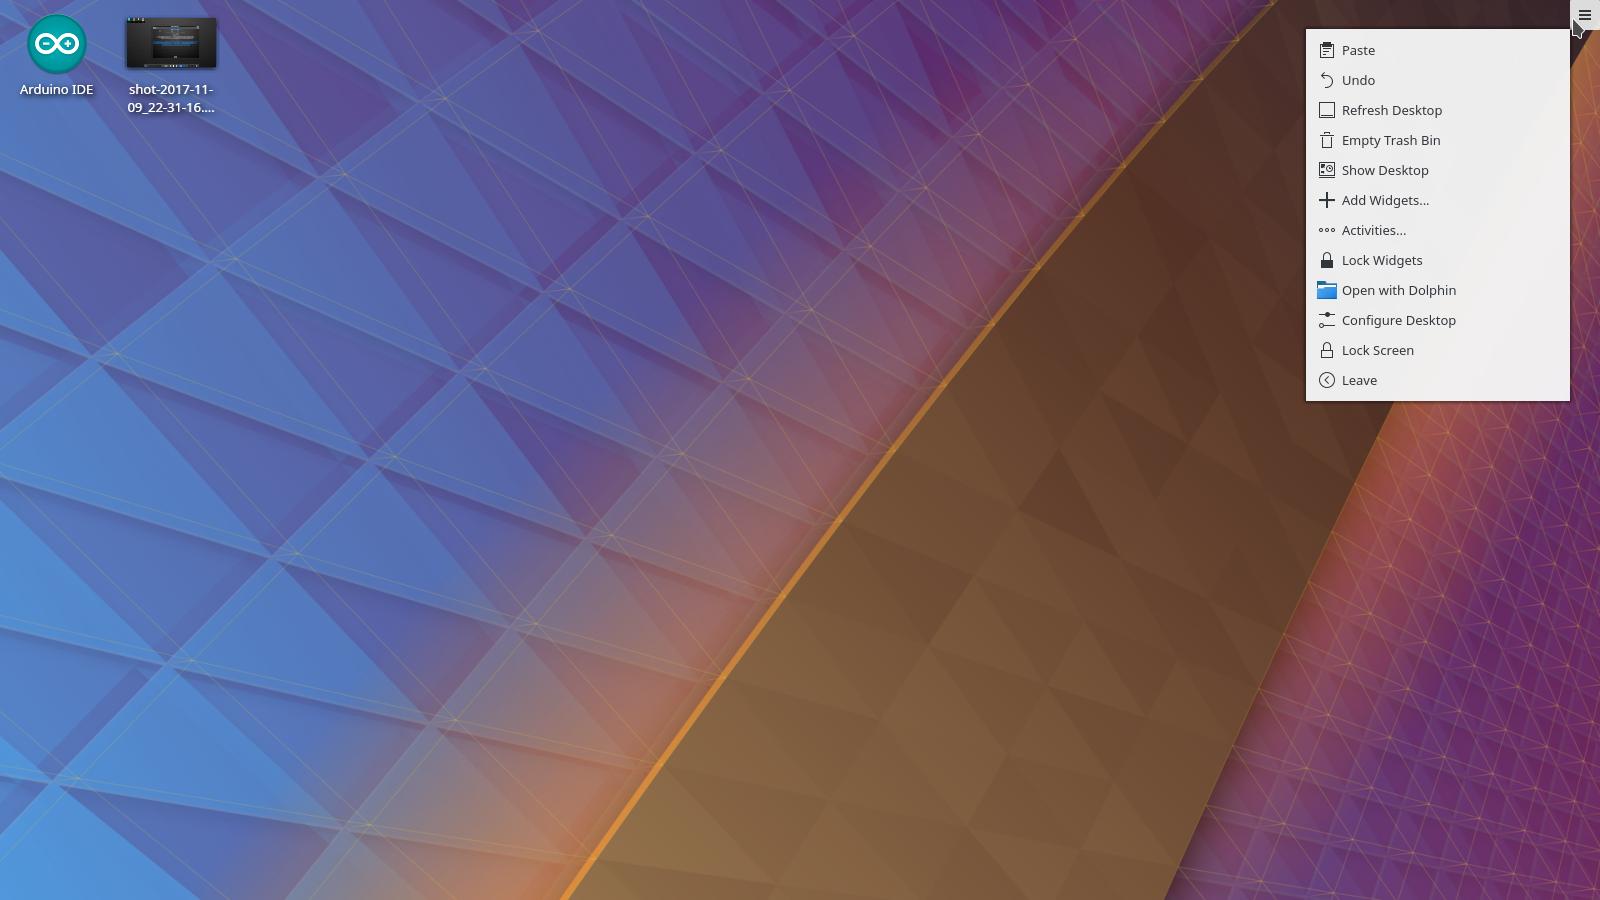 How to install program on Ubuntu: How to install Plasma Desktop 5 11